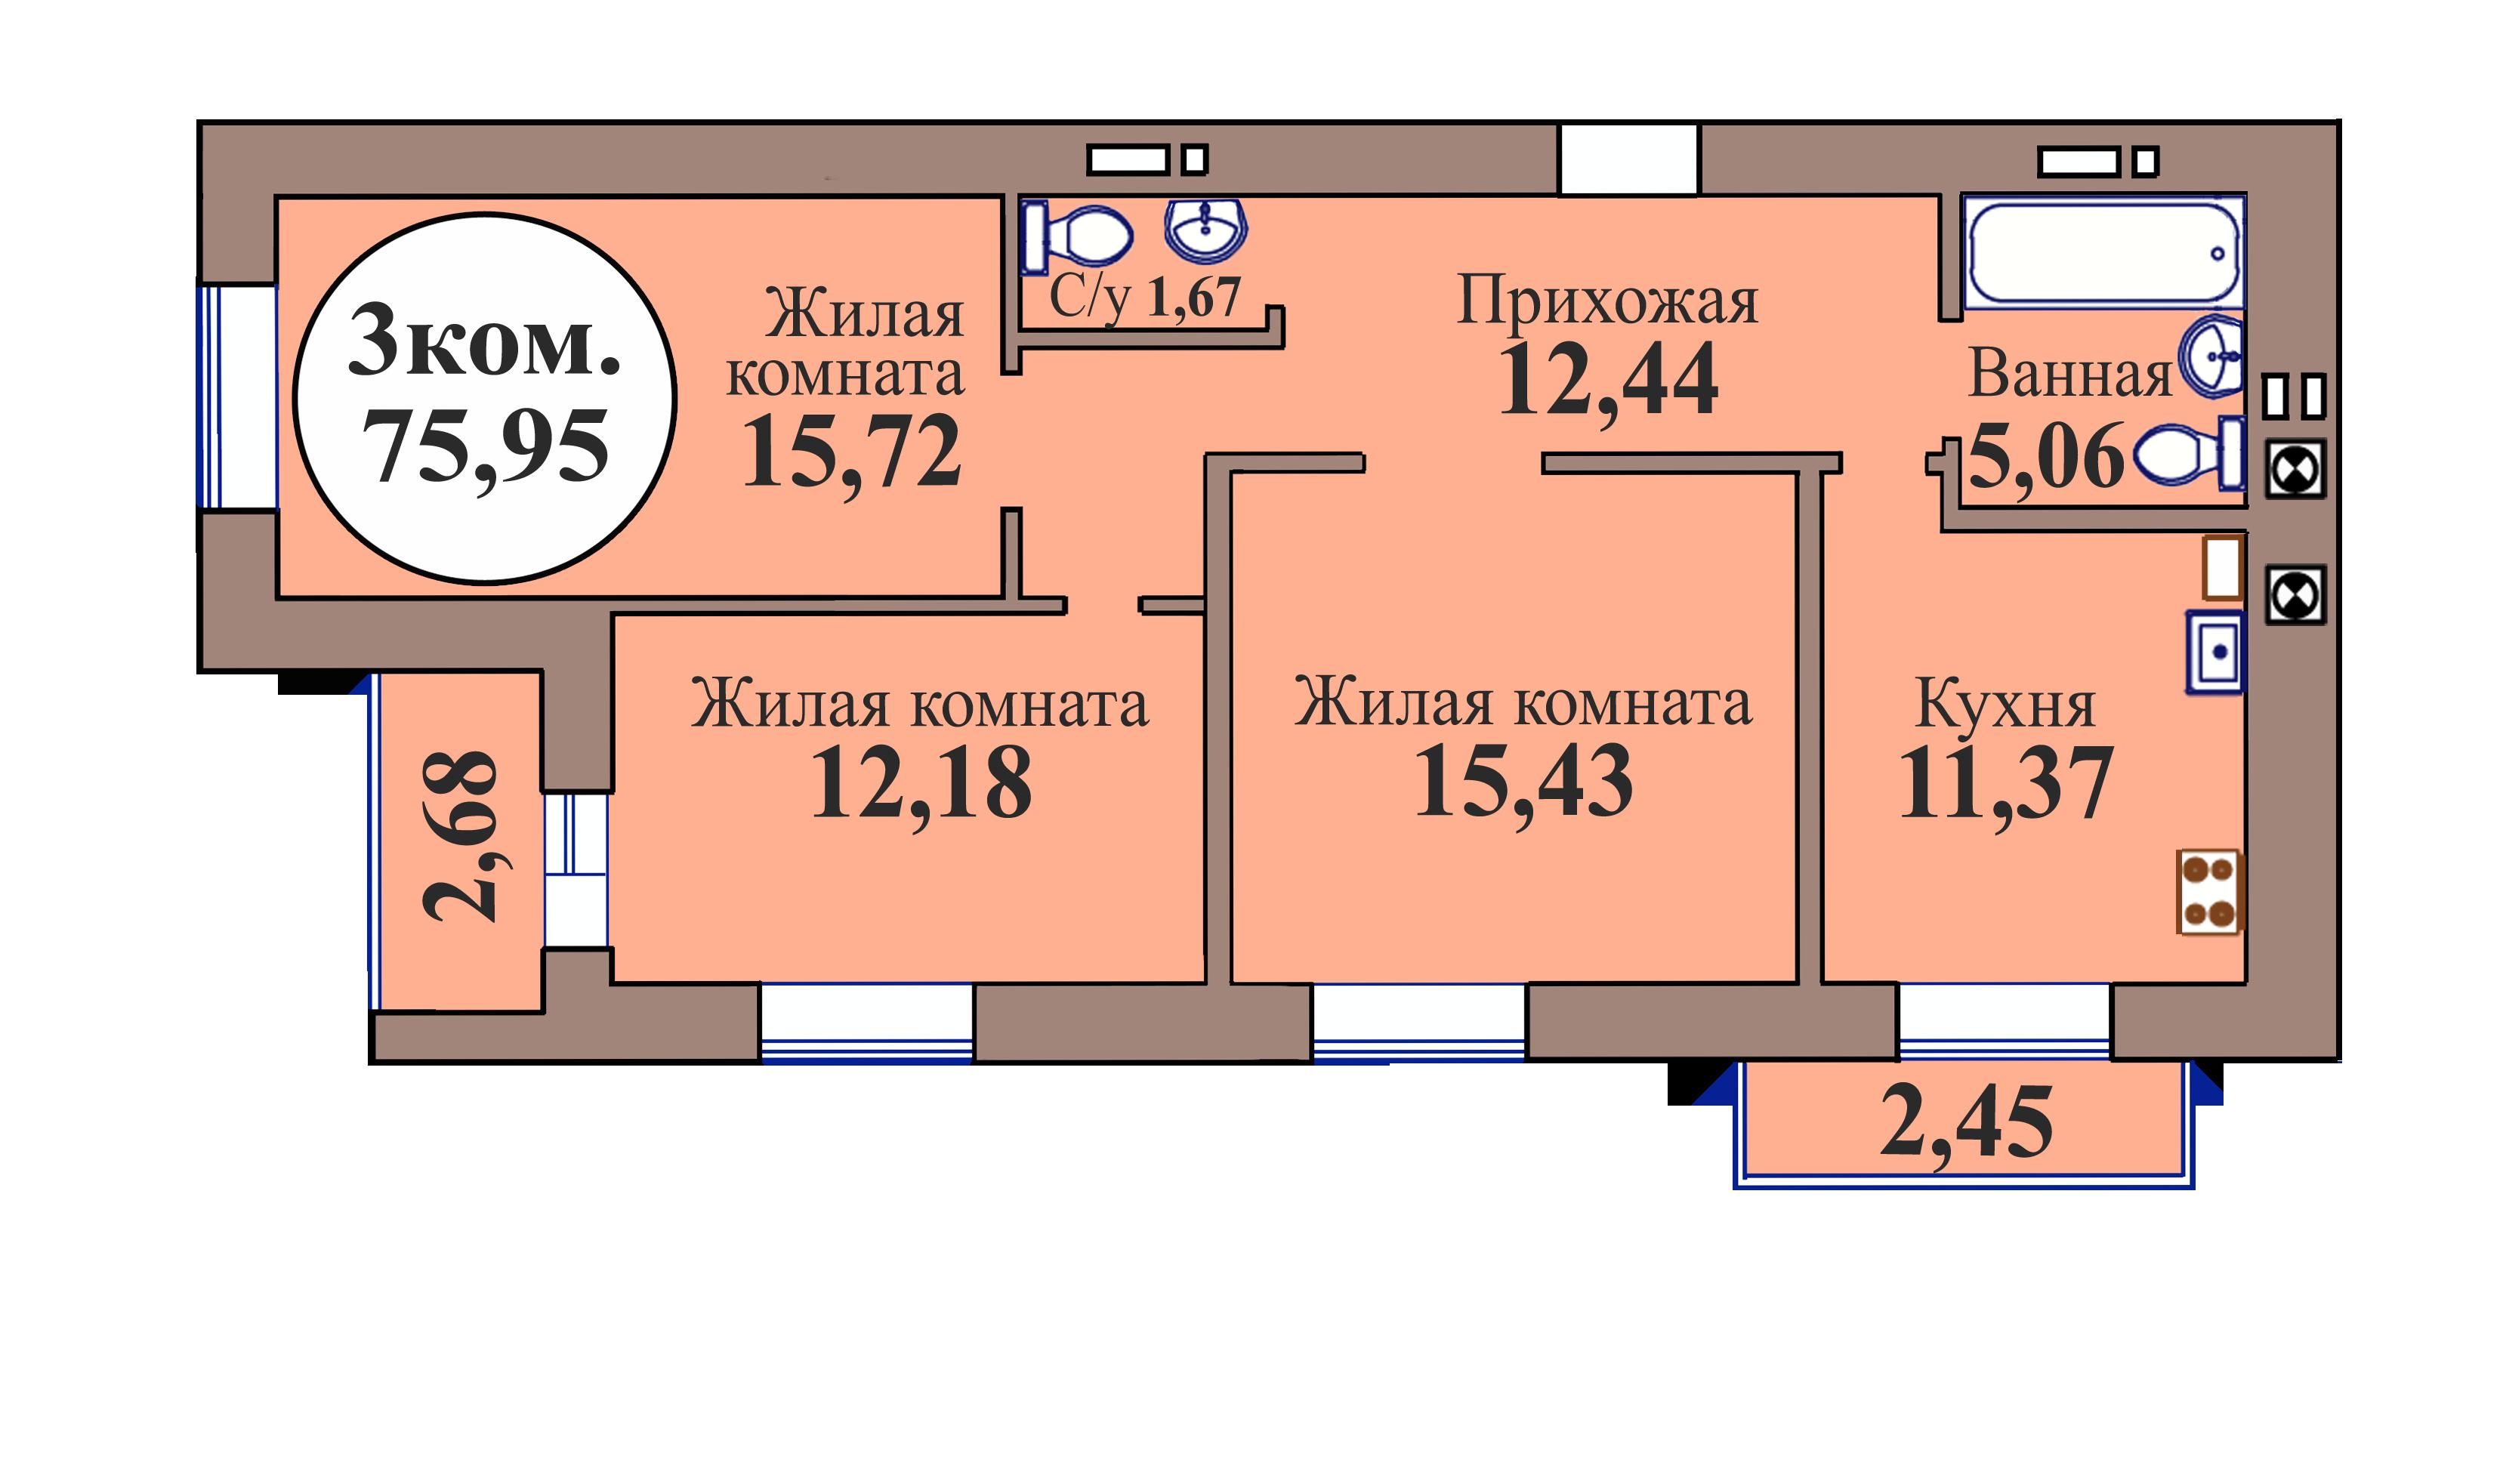 3-комн. кв. по пер. Калининградский, 5 кв. 212 в Калининграде